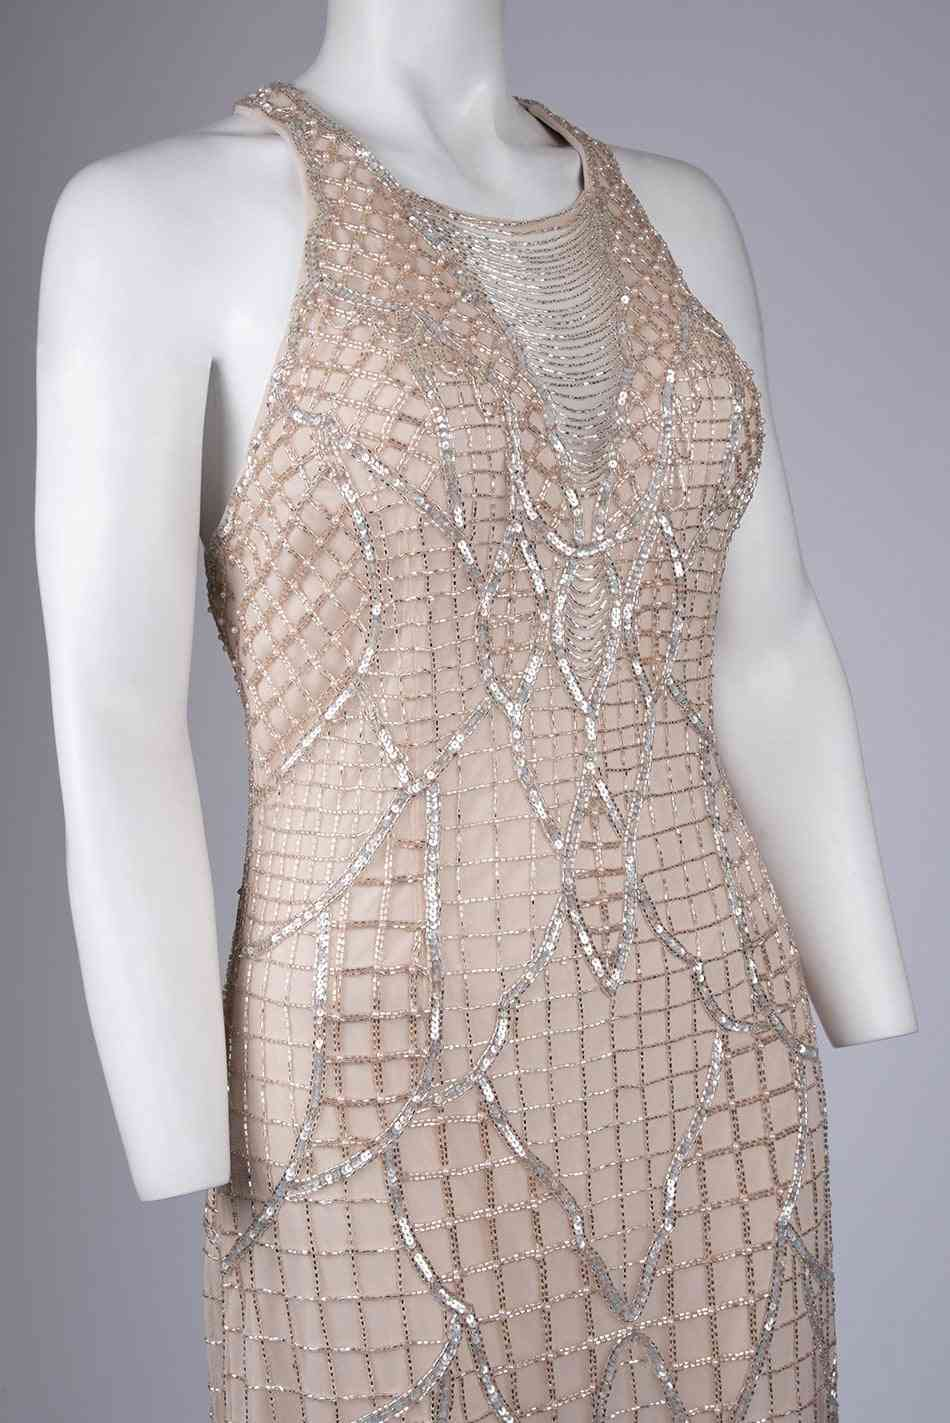 Criss Cross Back, Beaded Gown Dress